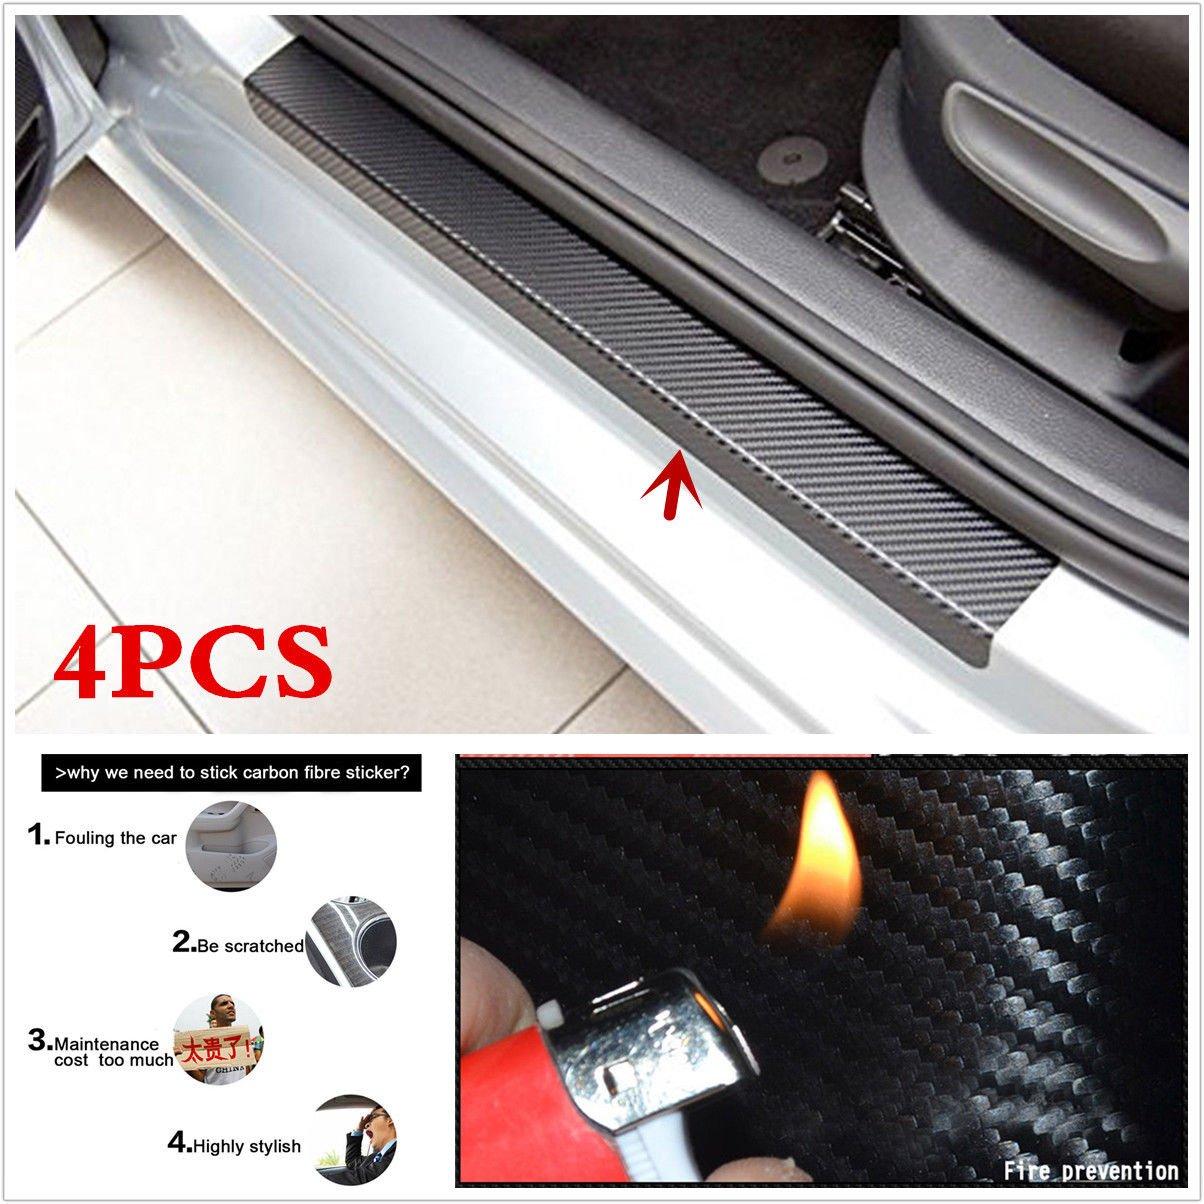 4PCS Accessories 3D Carbon Fiber Black Car door Plate Door Sill Scuff Plate Cars Sticker Anti-kick Scratch Auto Car-styling